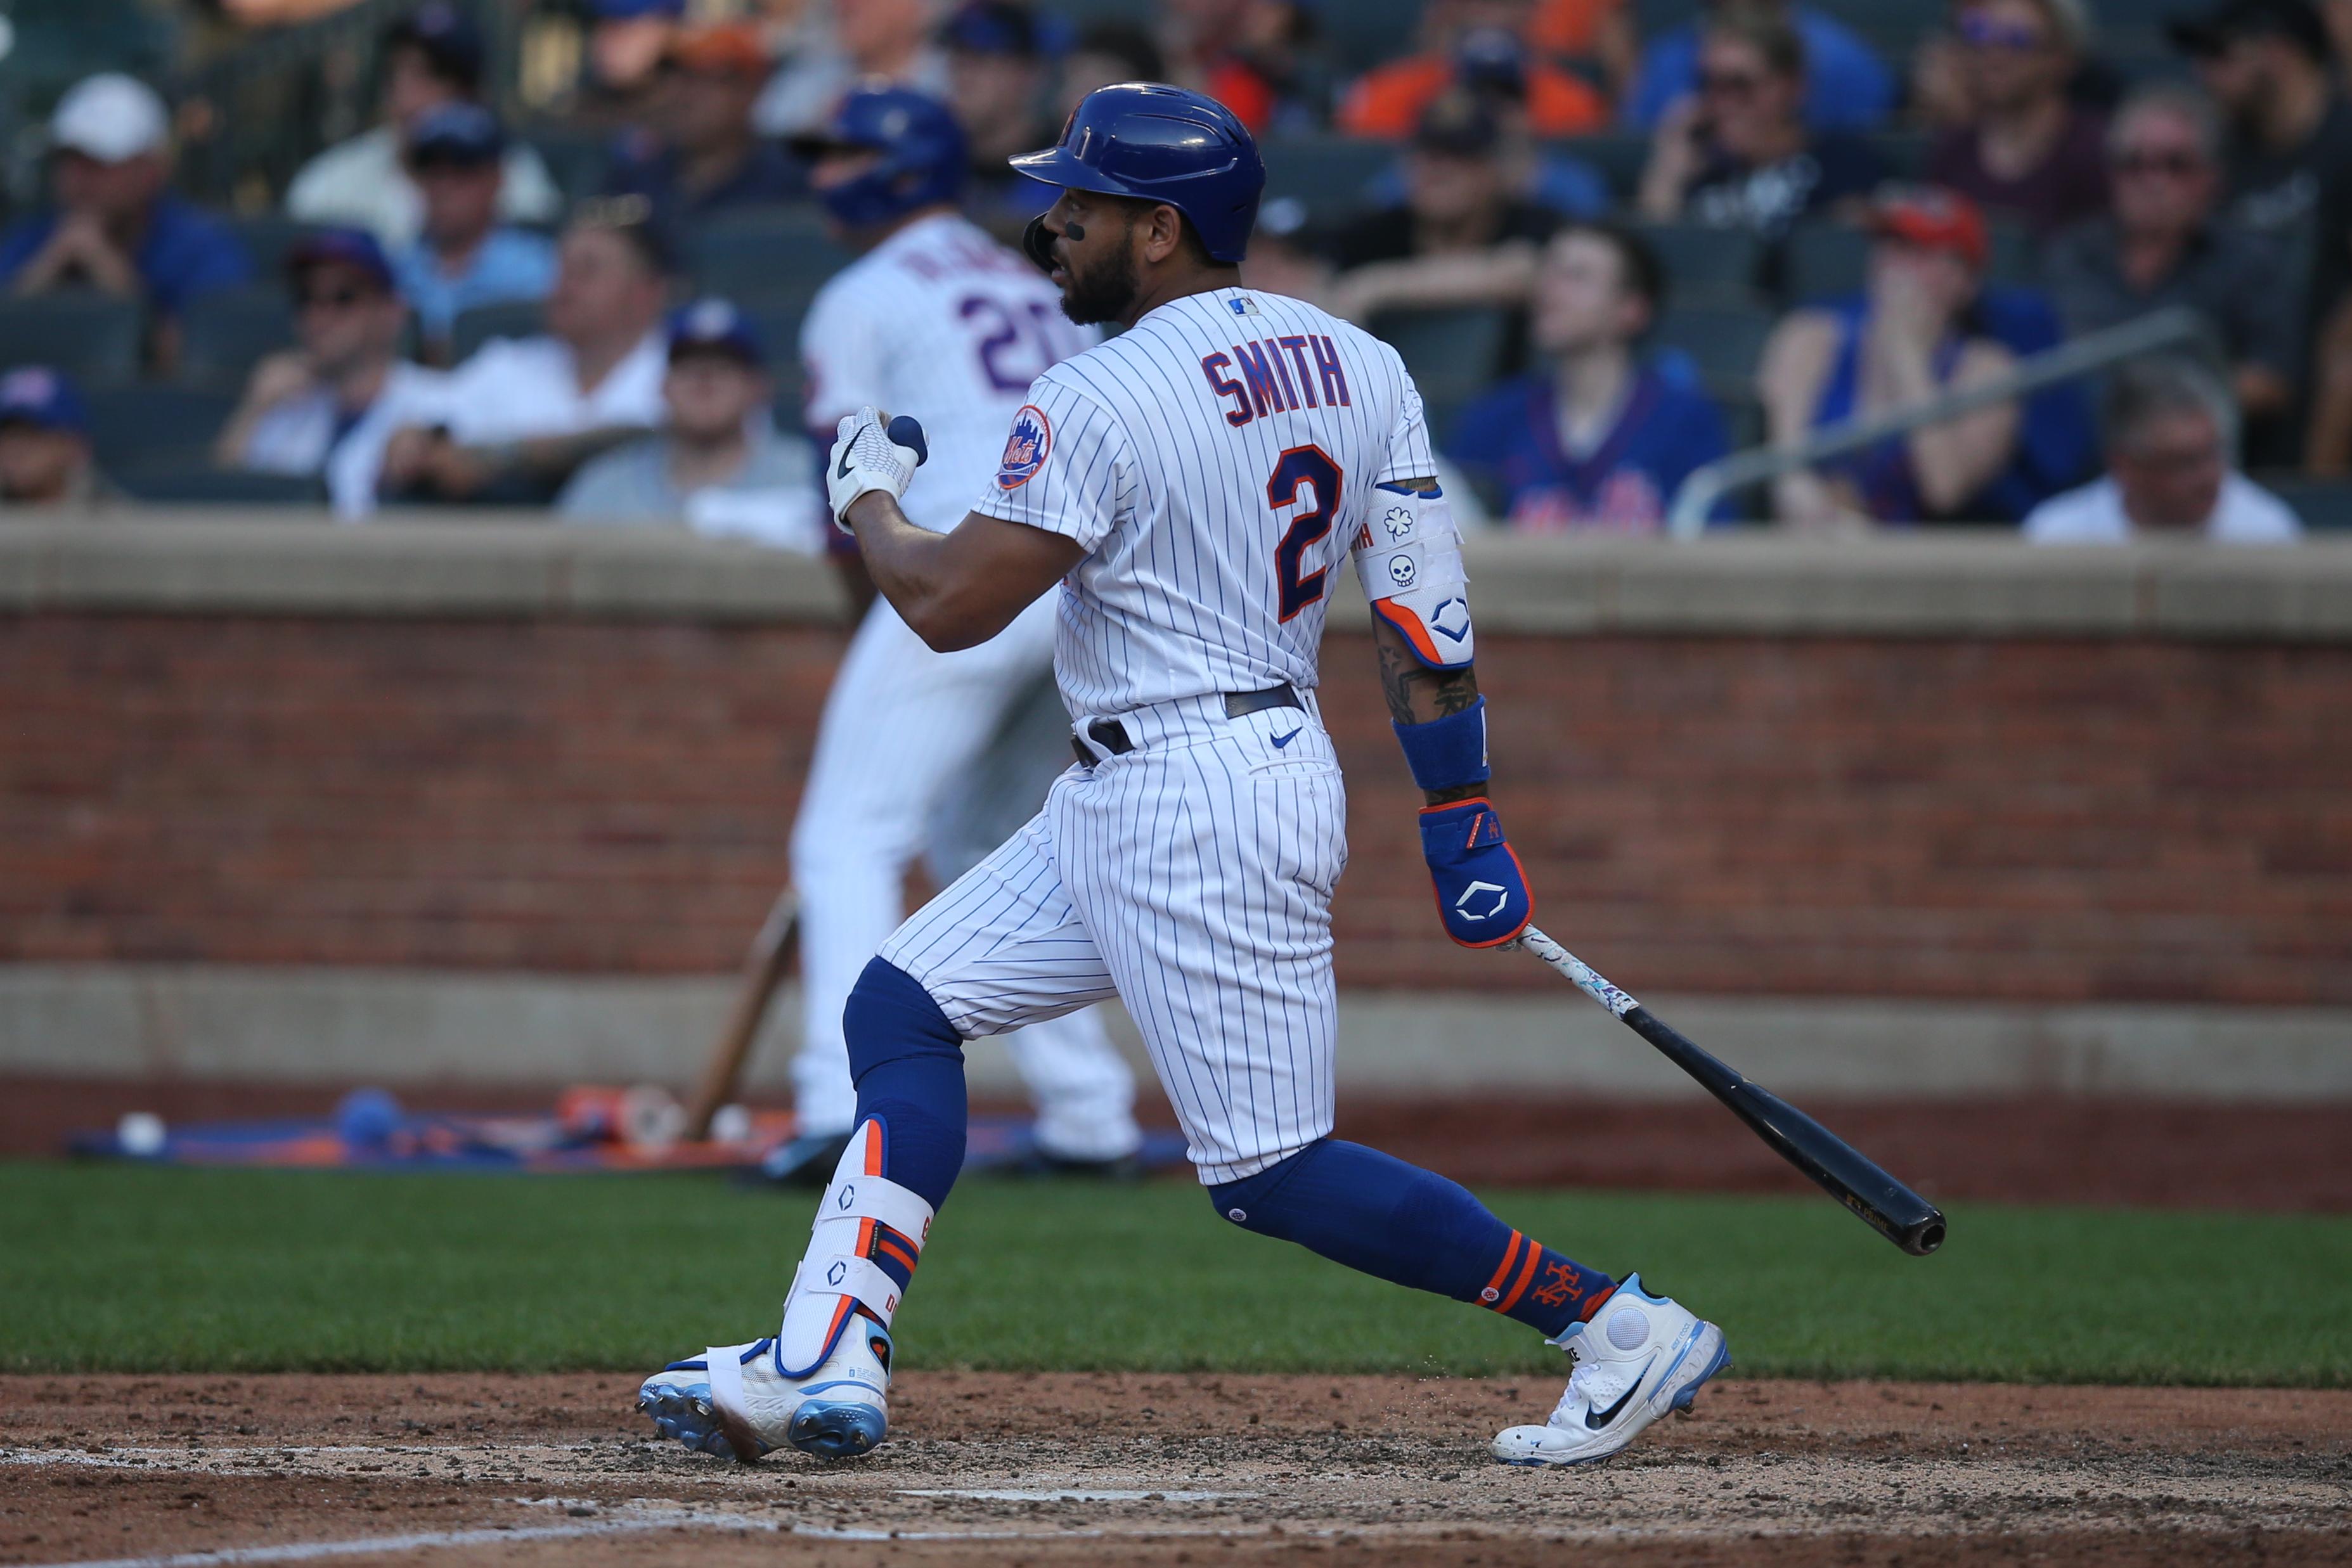 6/22/21 Game Preview: Atlanta Braves at New York Mets